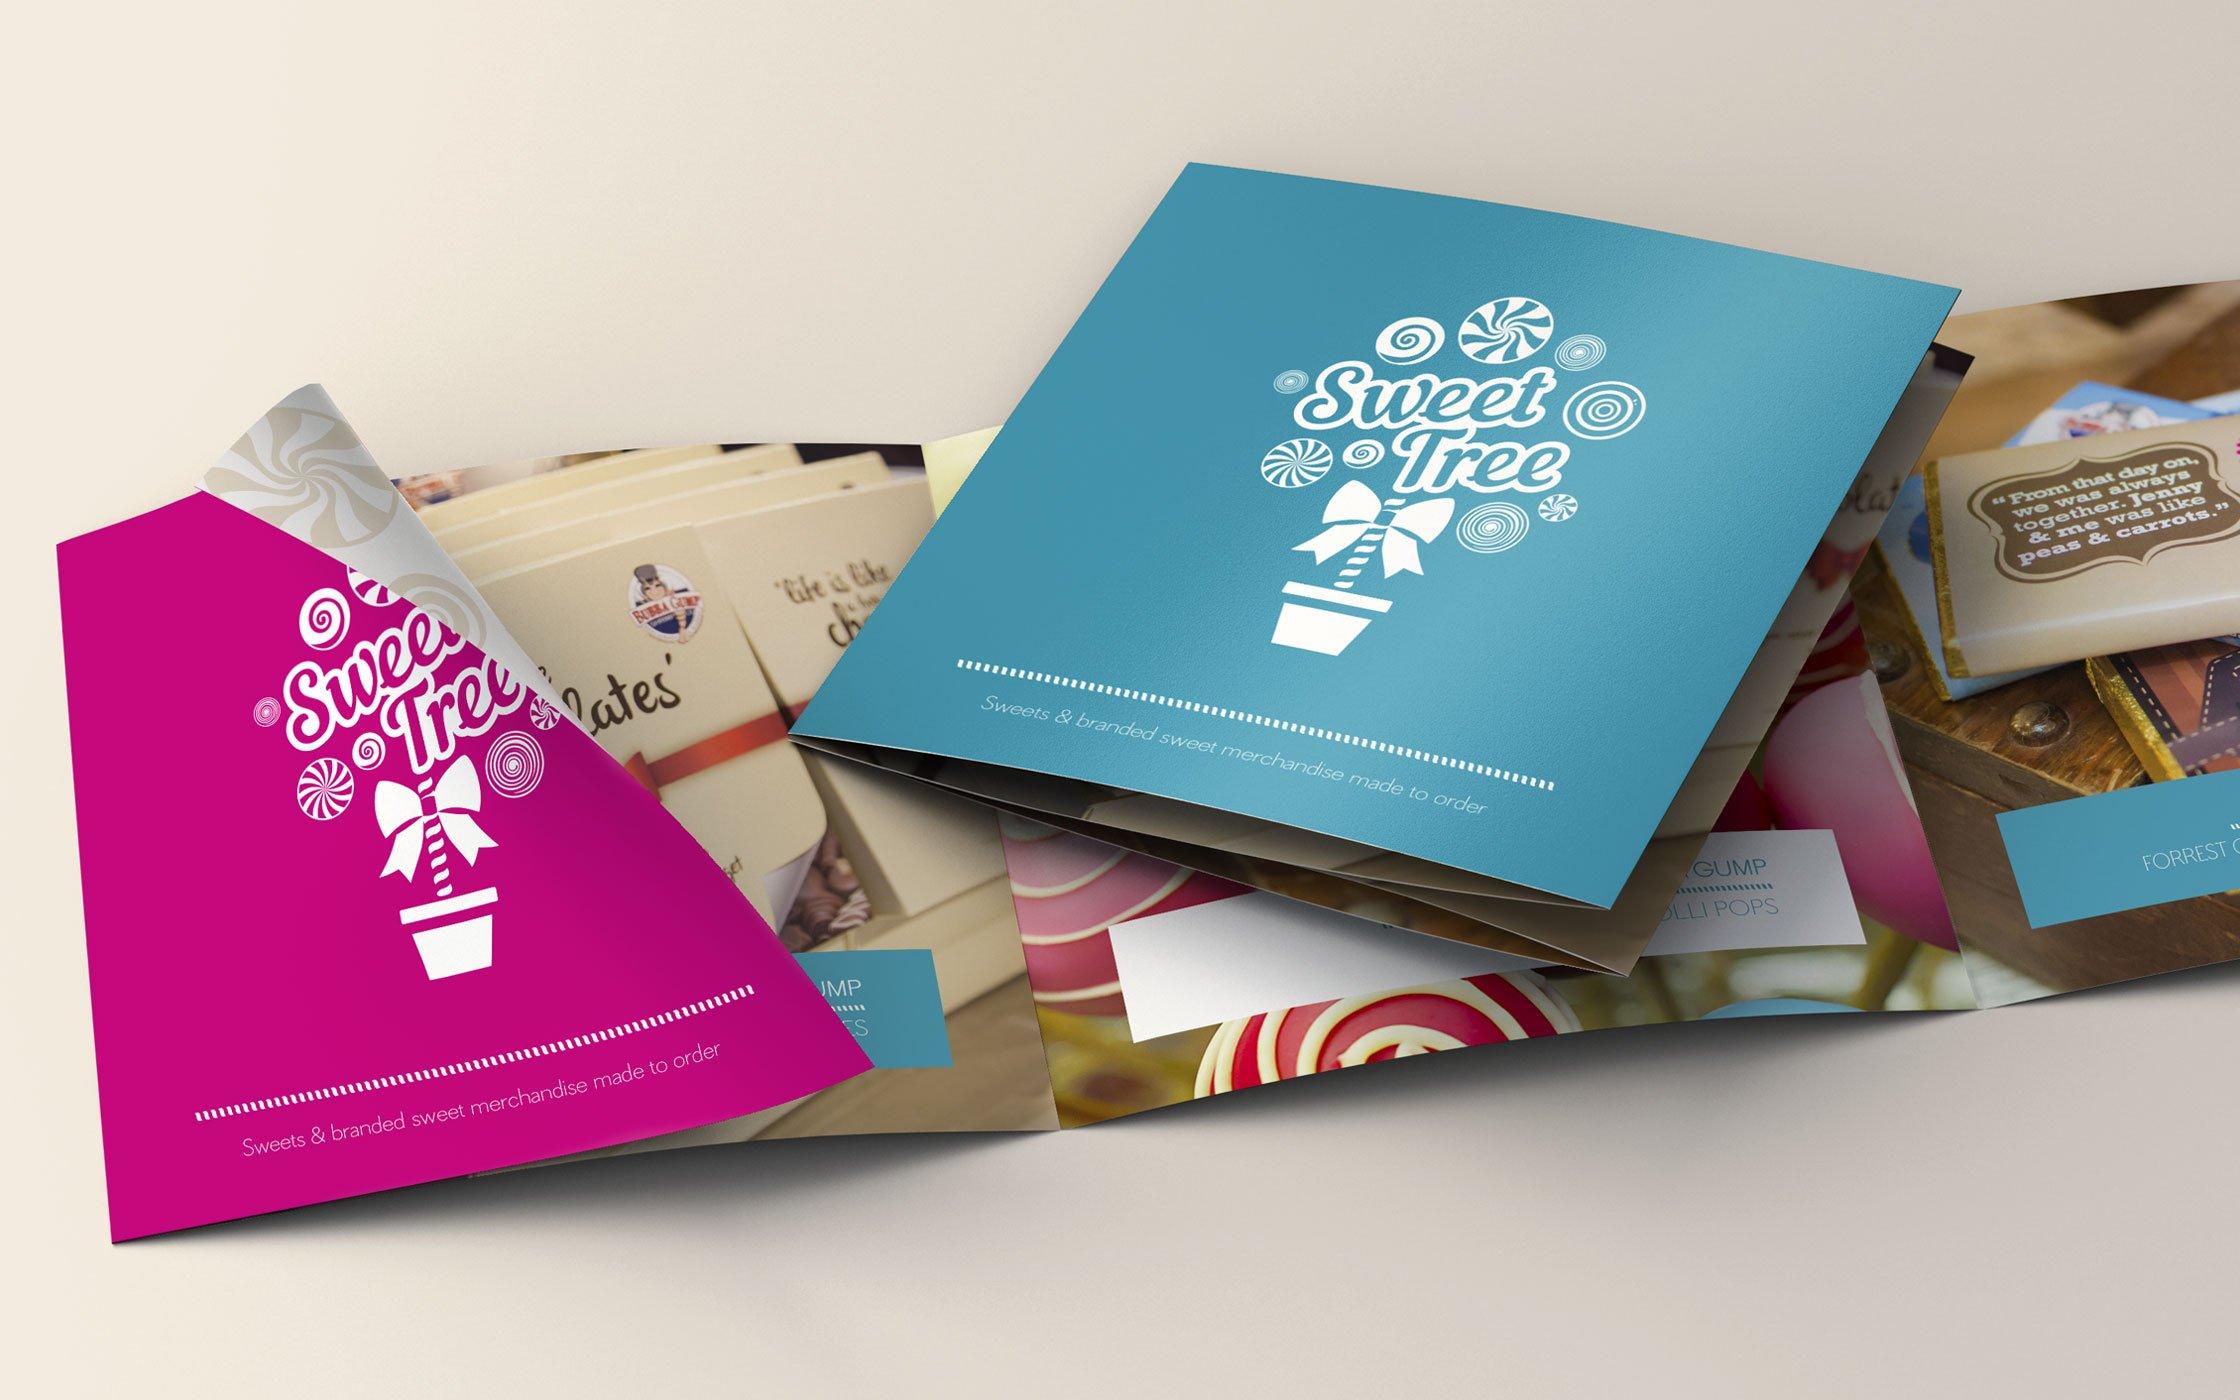 Sweet Tree marketing materials